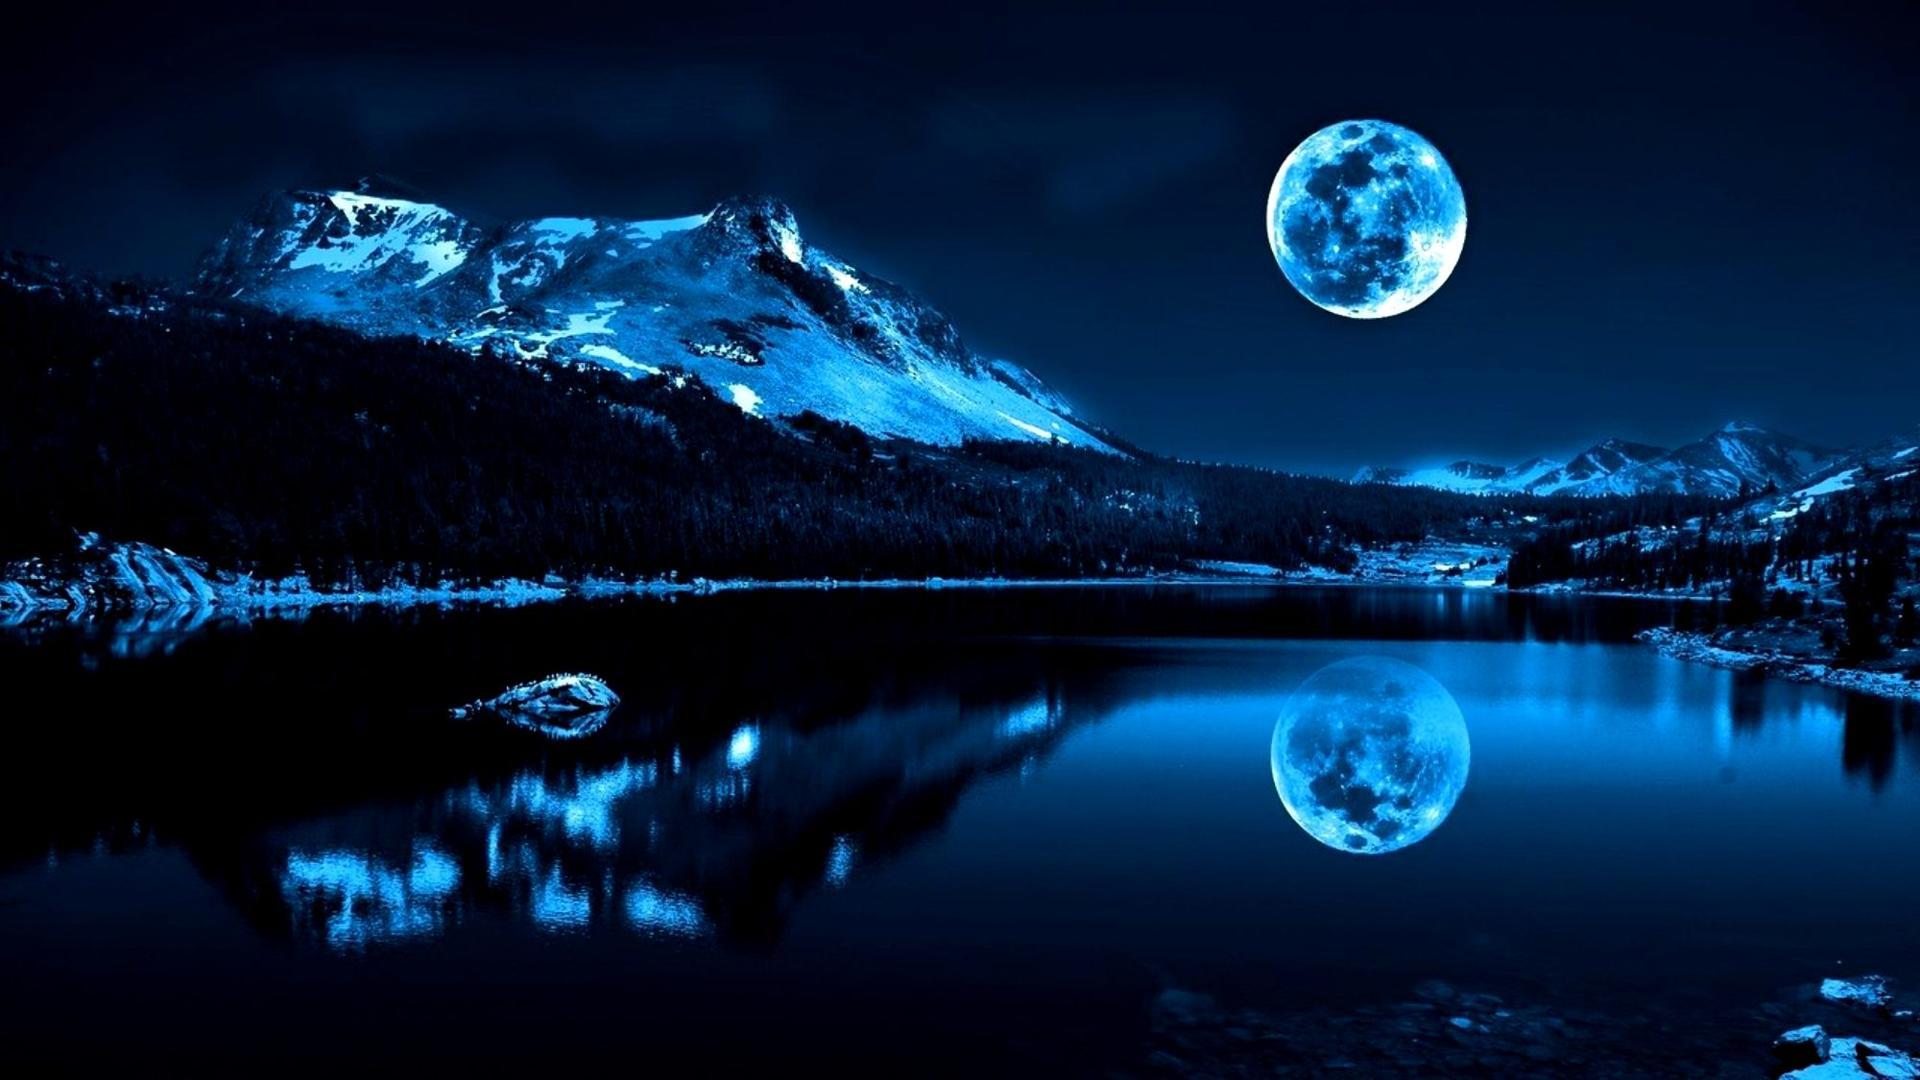 Full Moon In A Winter Night Wallpaper Download 1920x1080